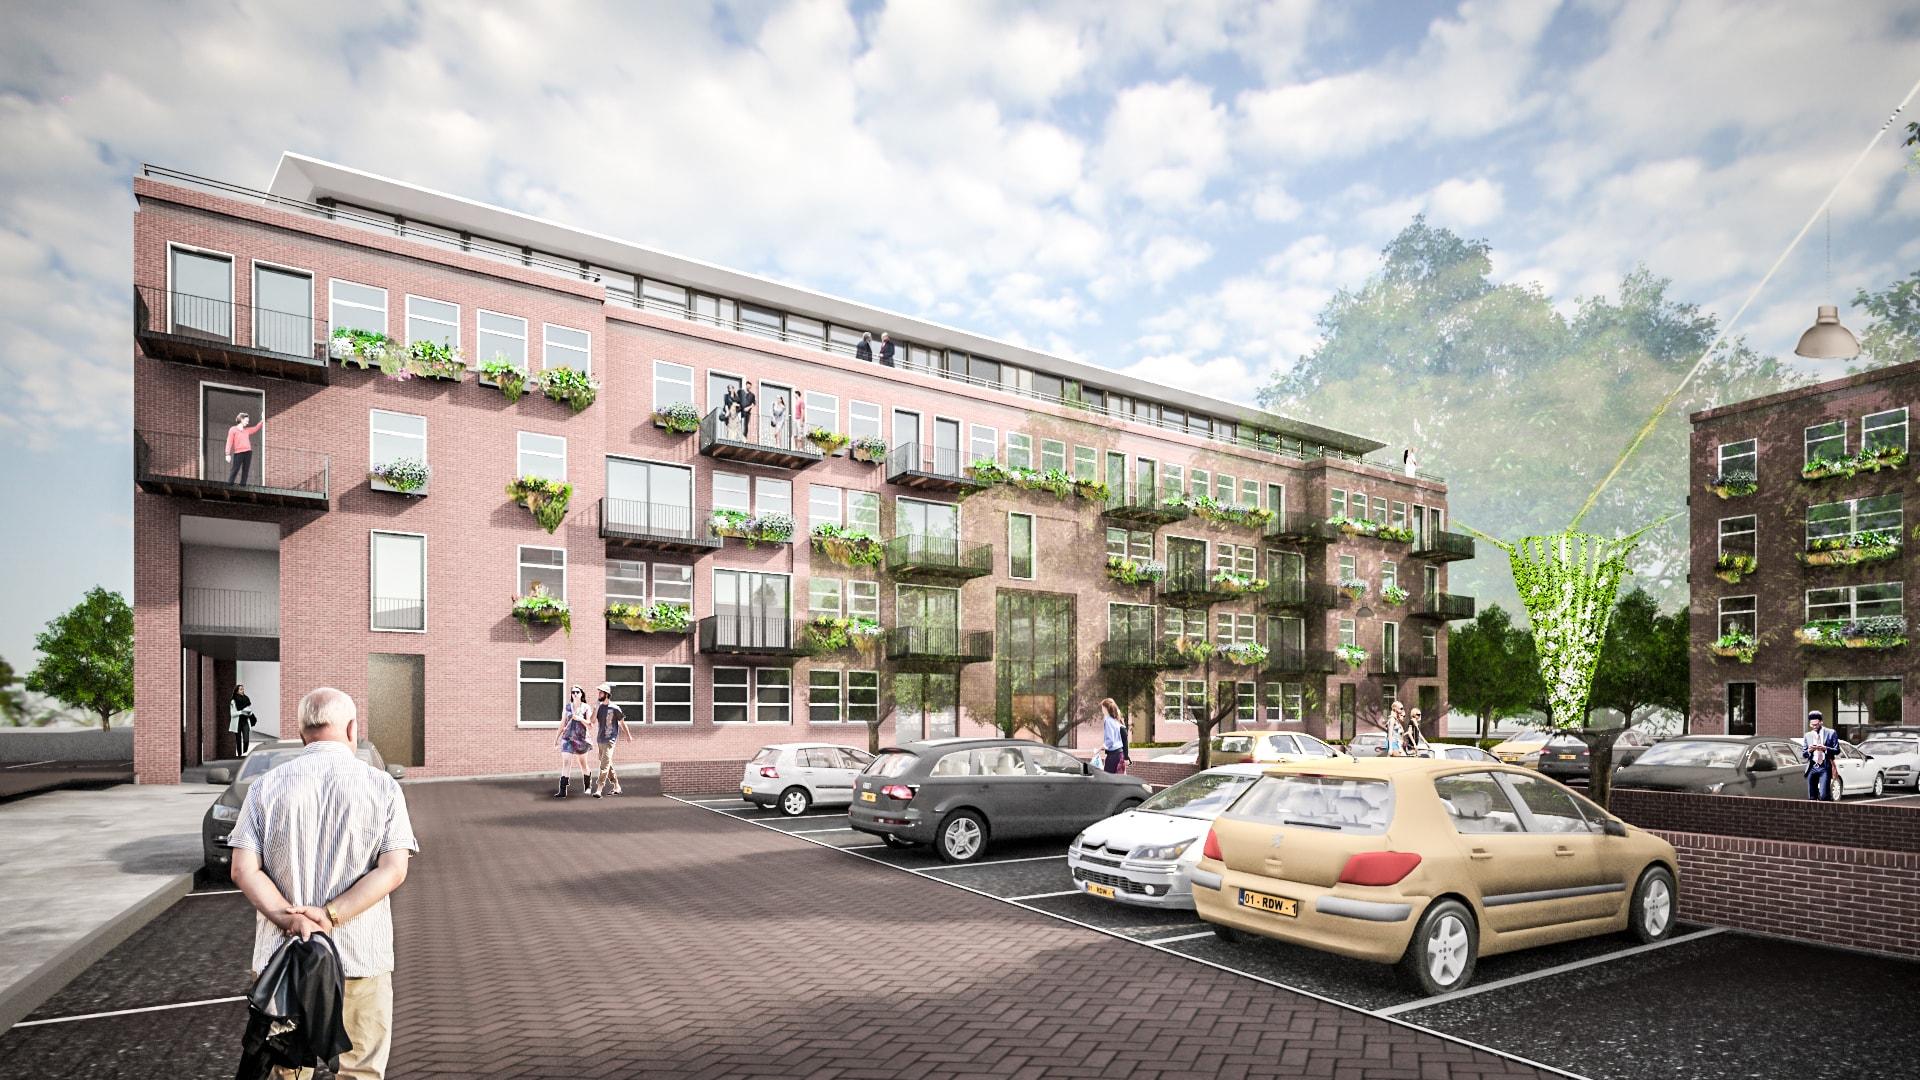 Zwolle JMW architecten